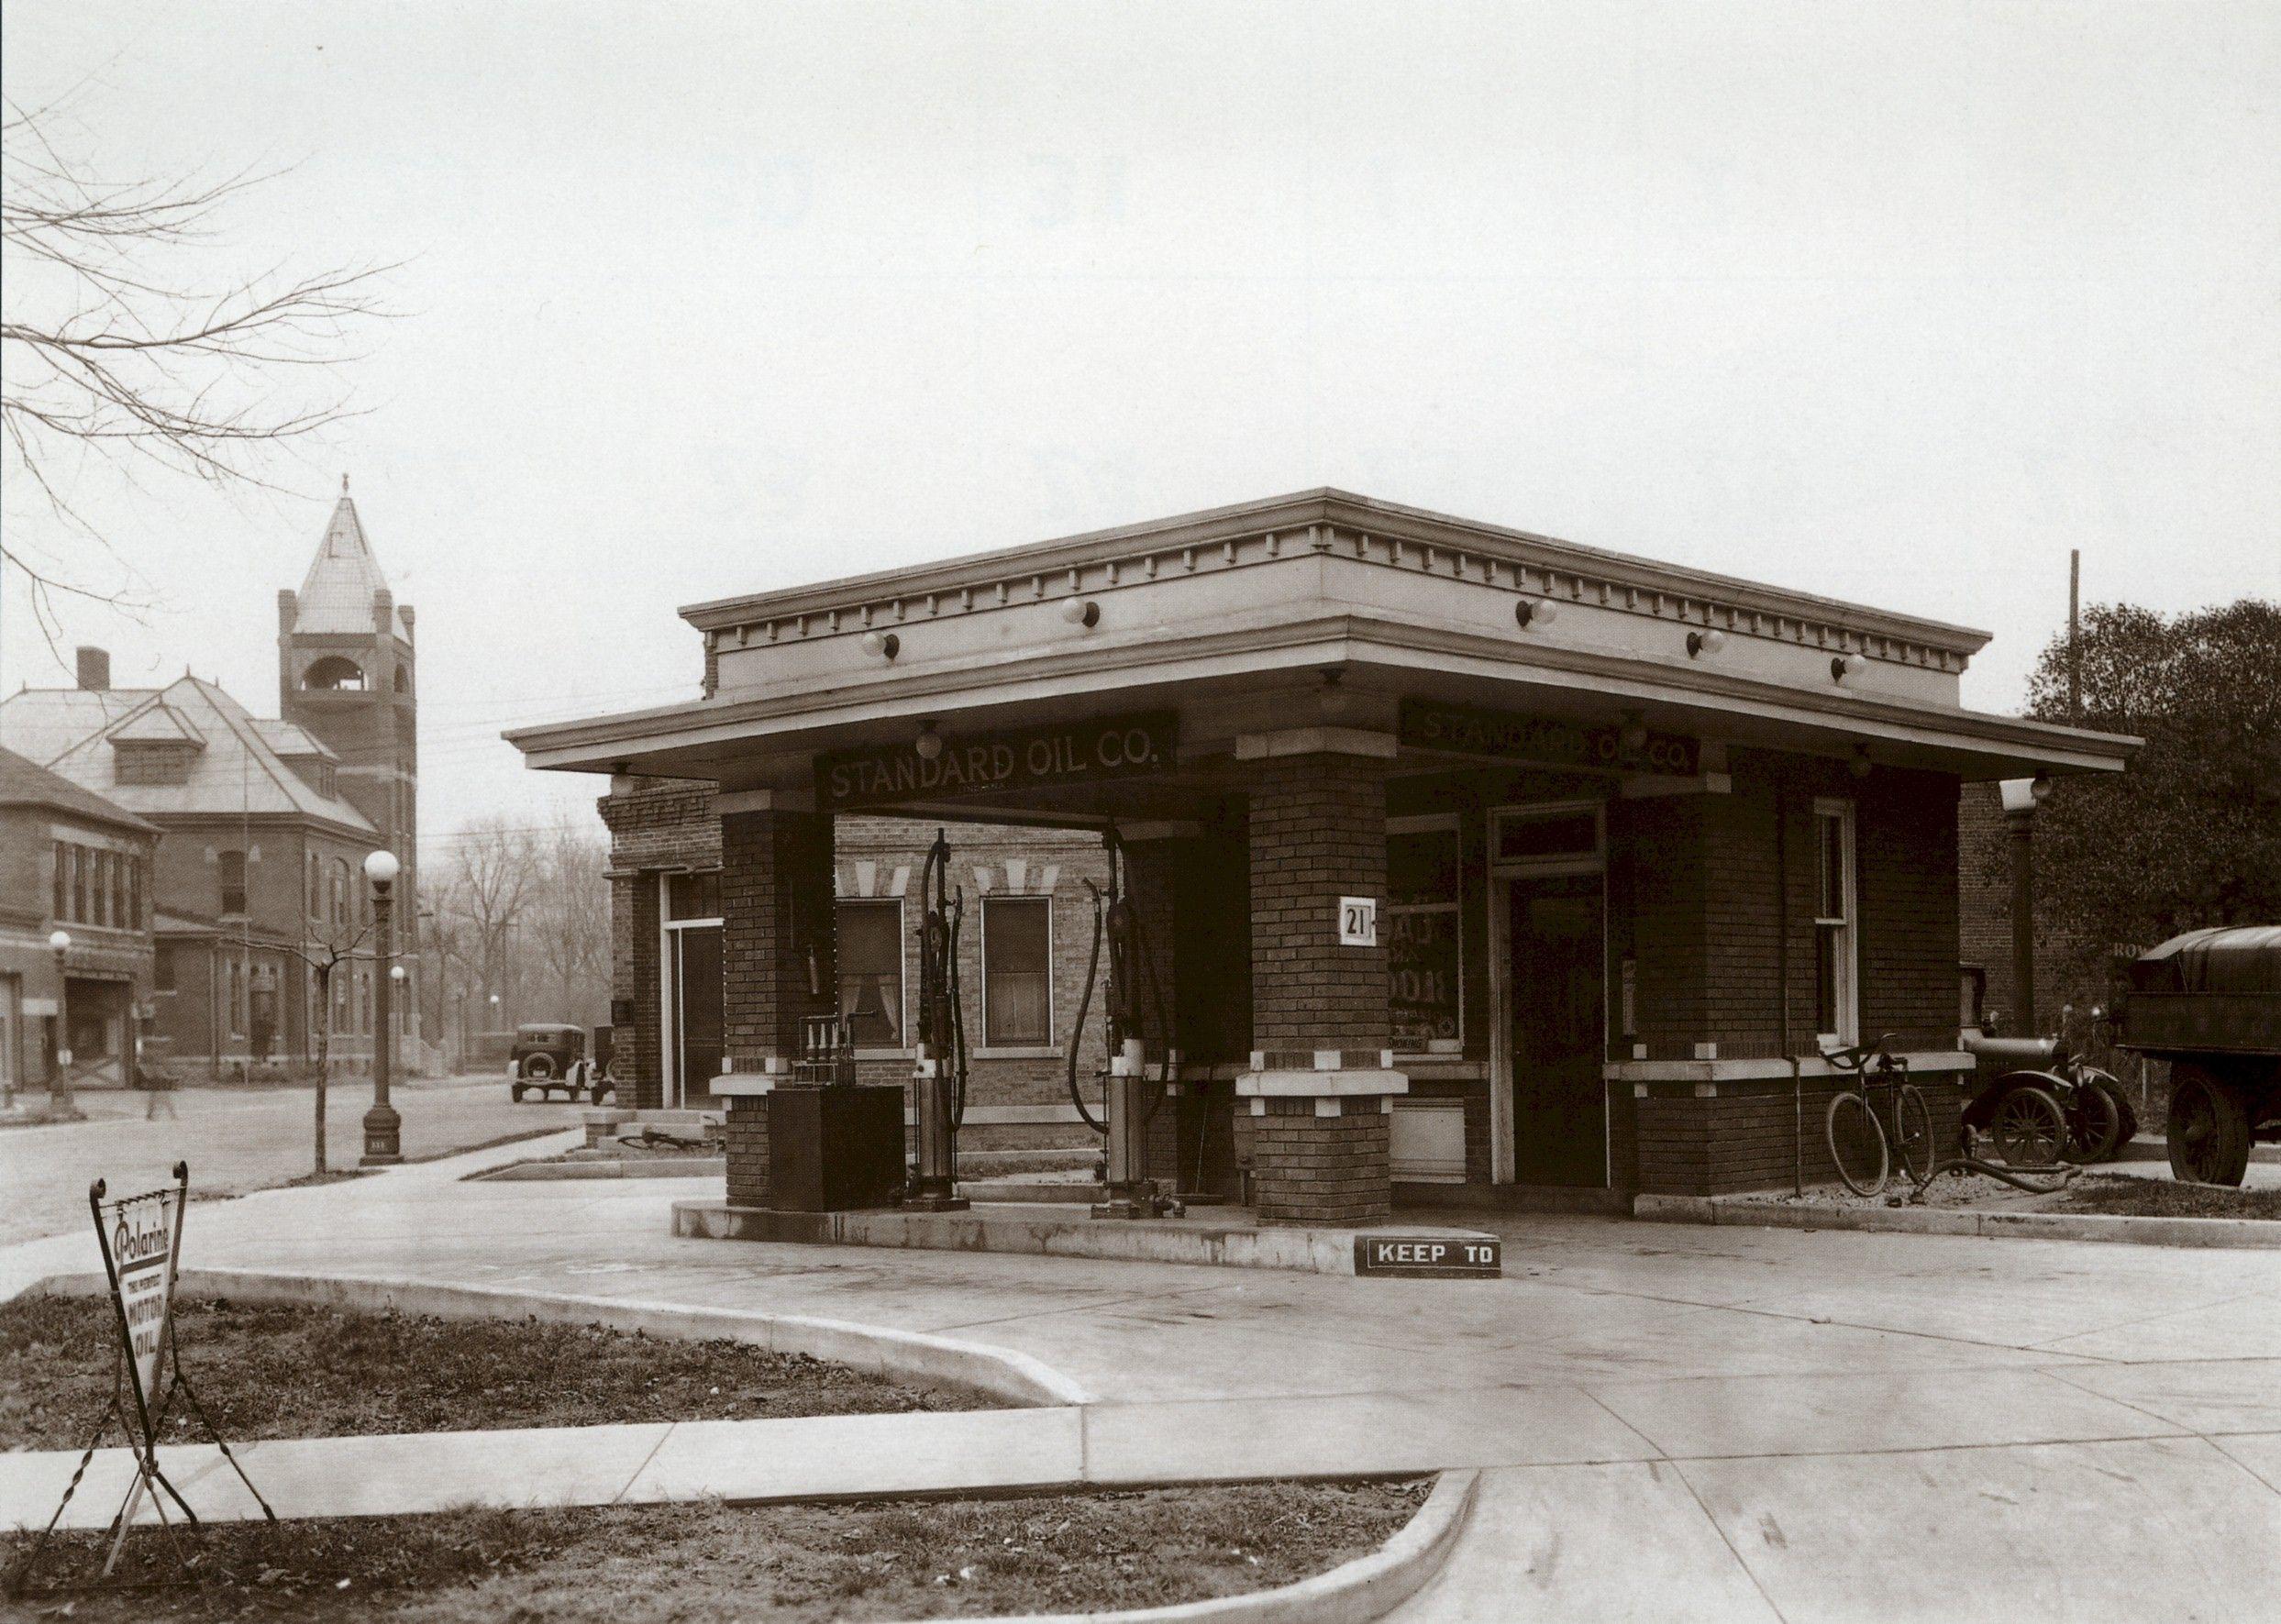 Standard Oil Urbana, IL. 1910's Old gas stations